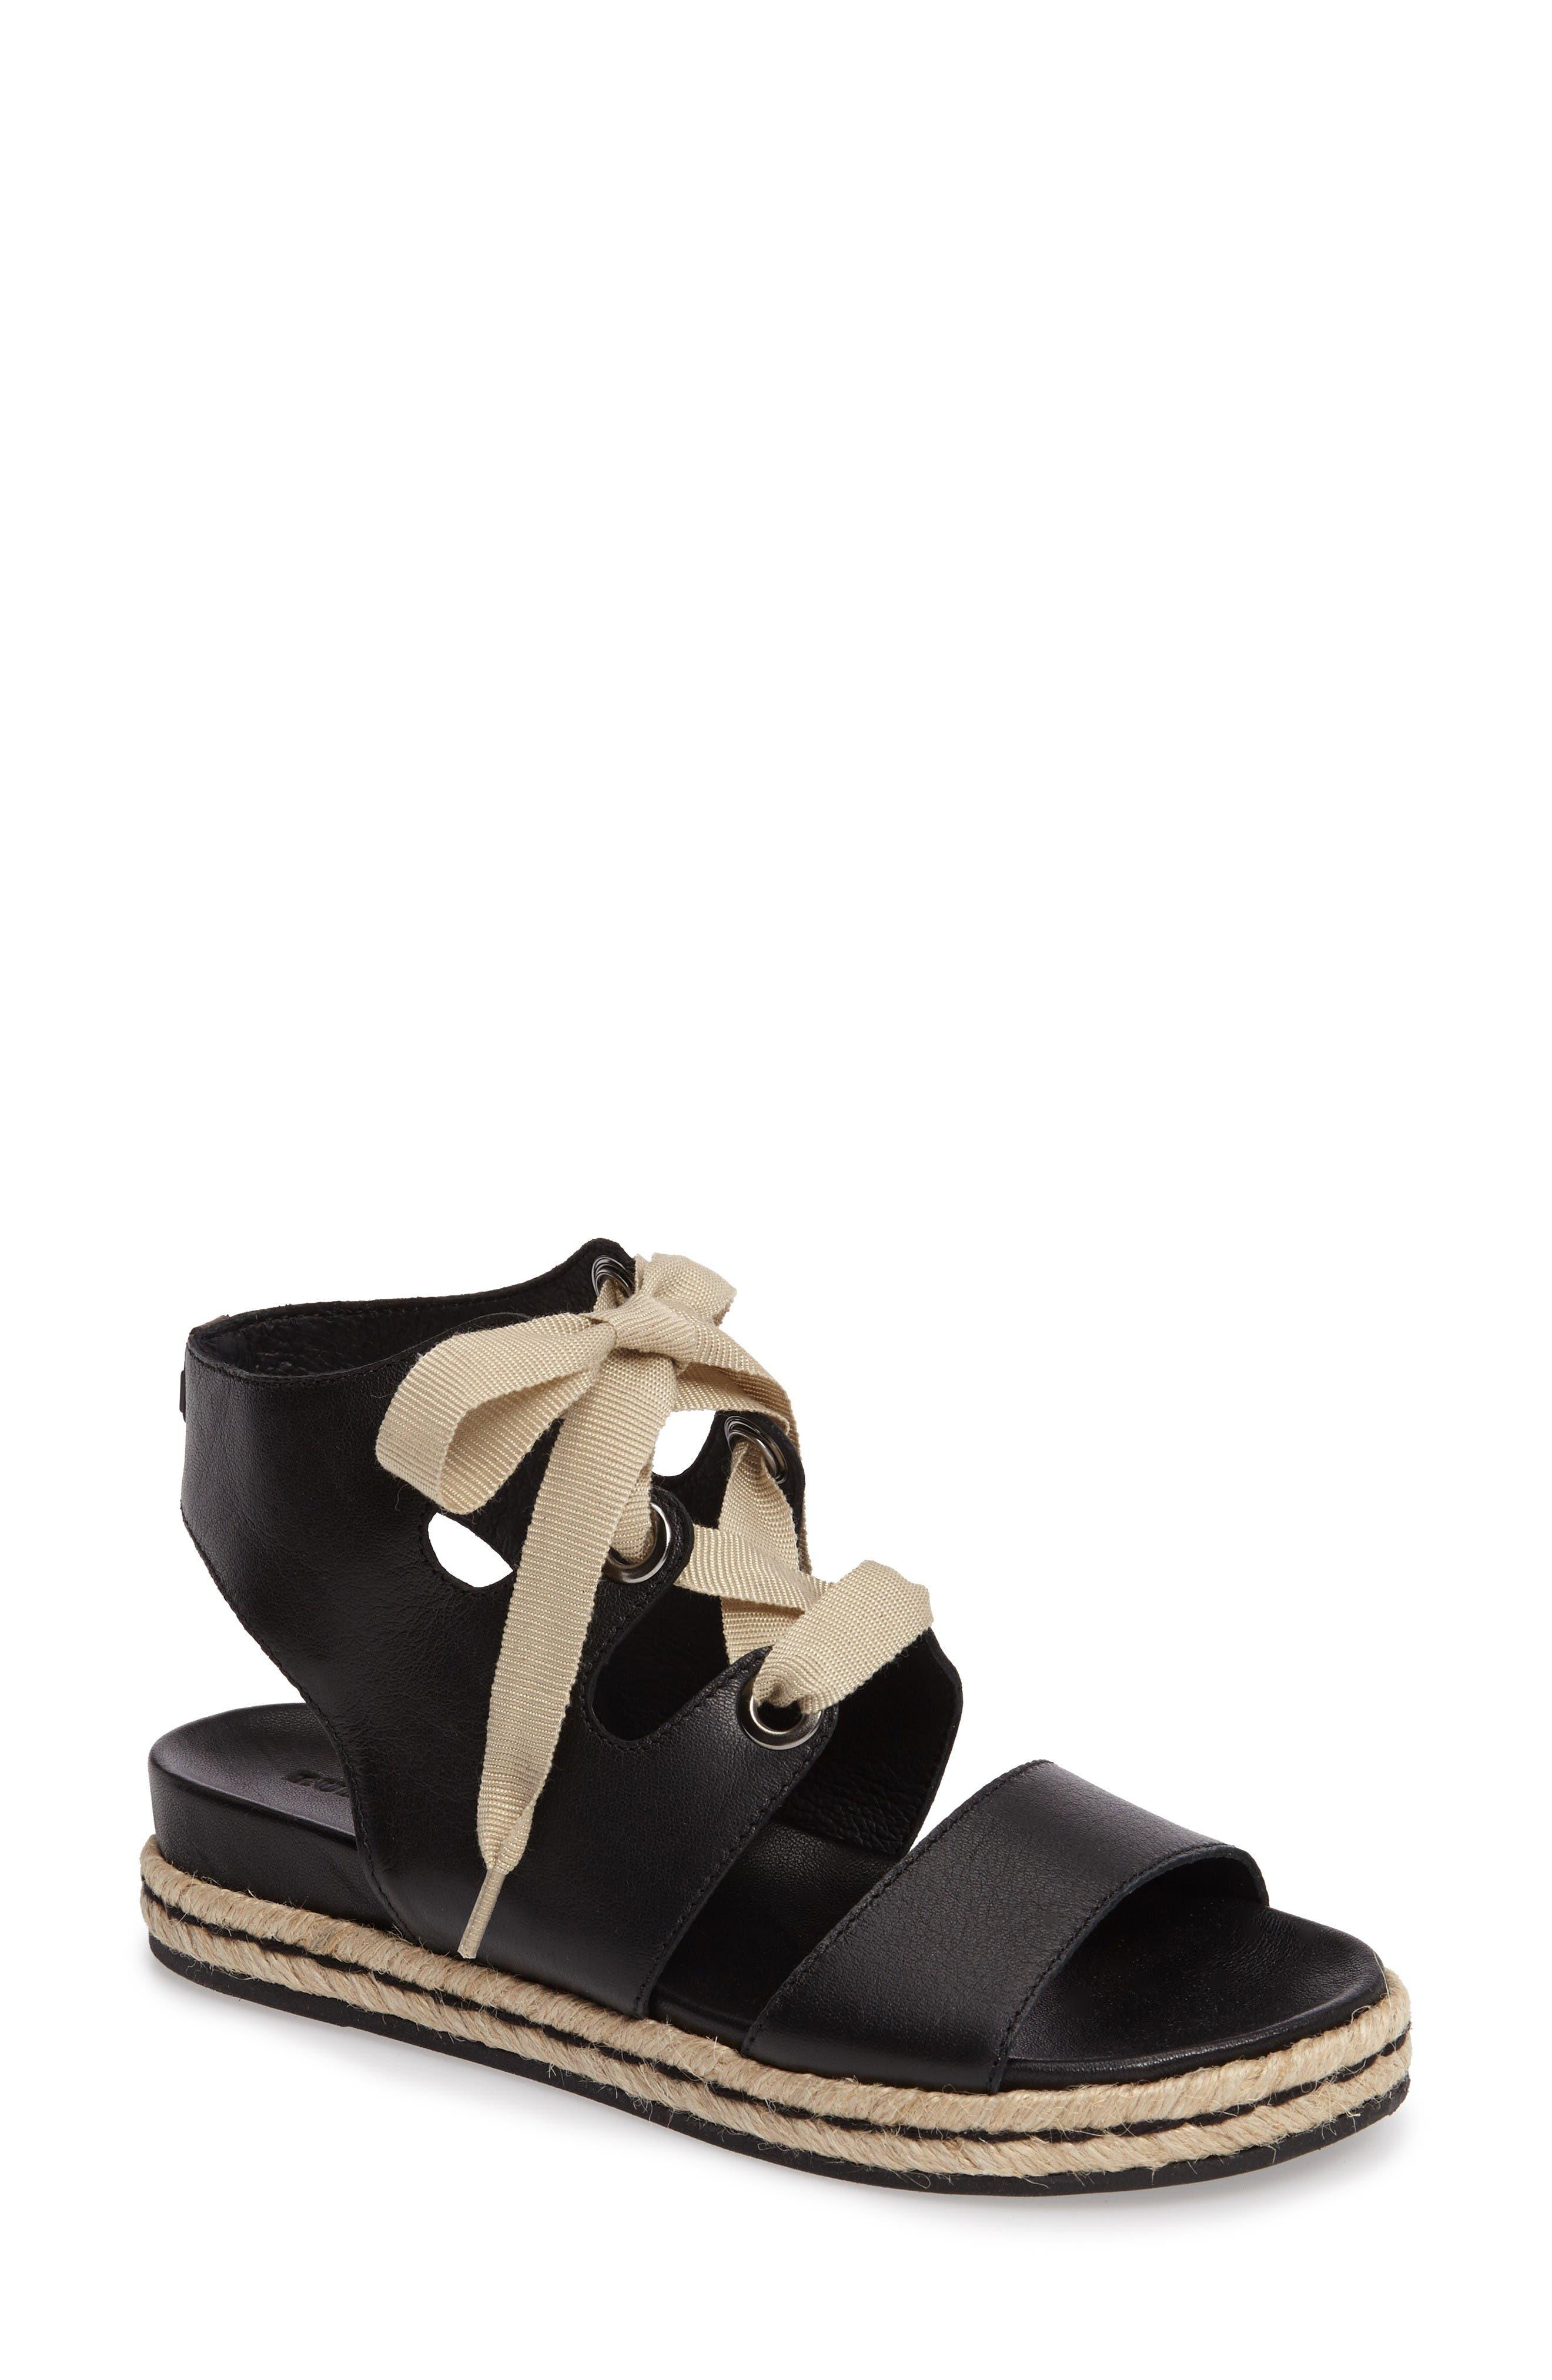 Rudsak Baptista Lace-Up Sandal (Women)